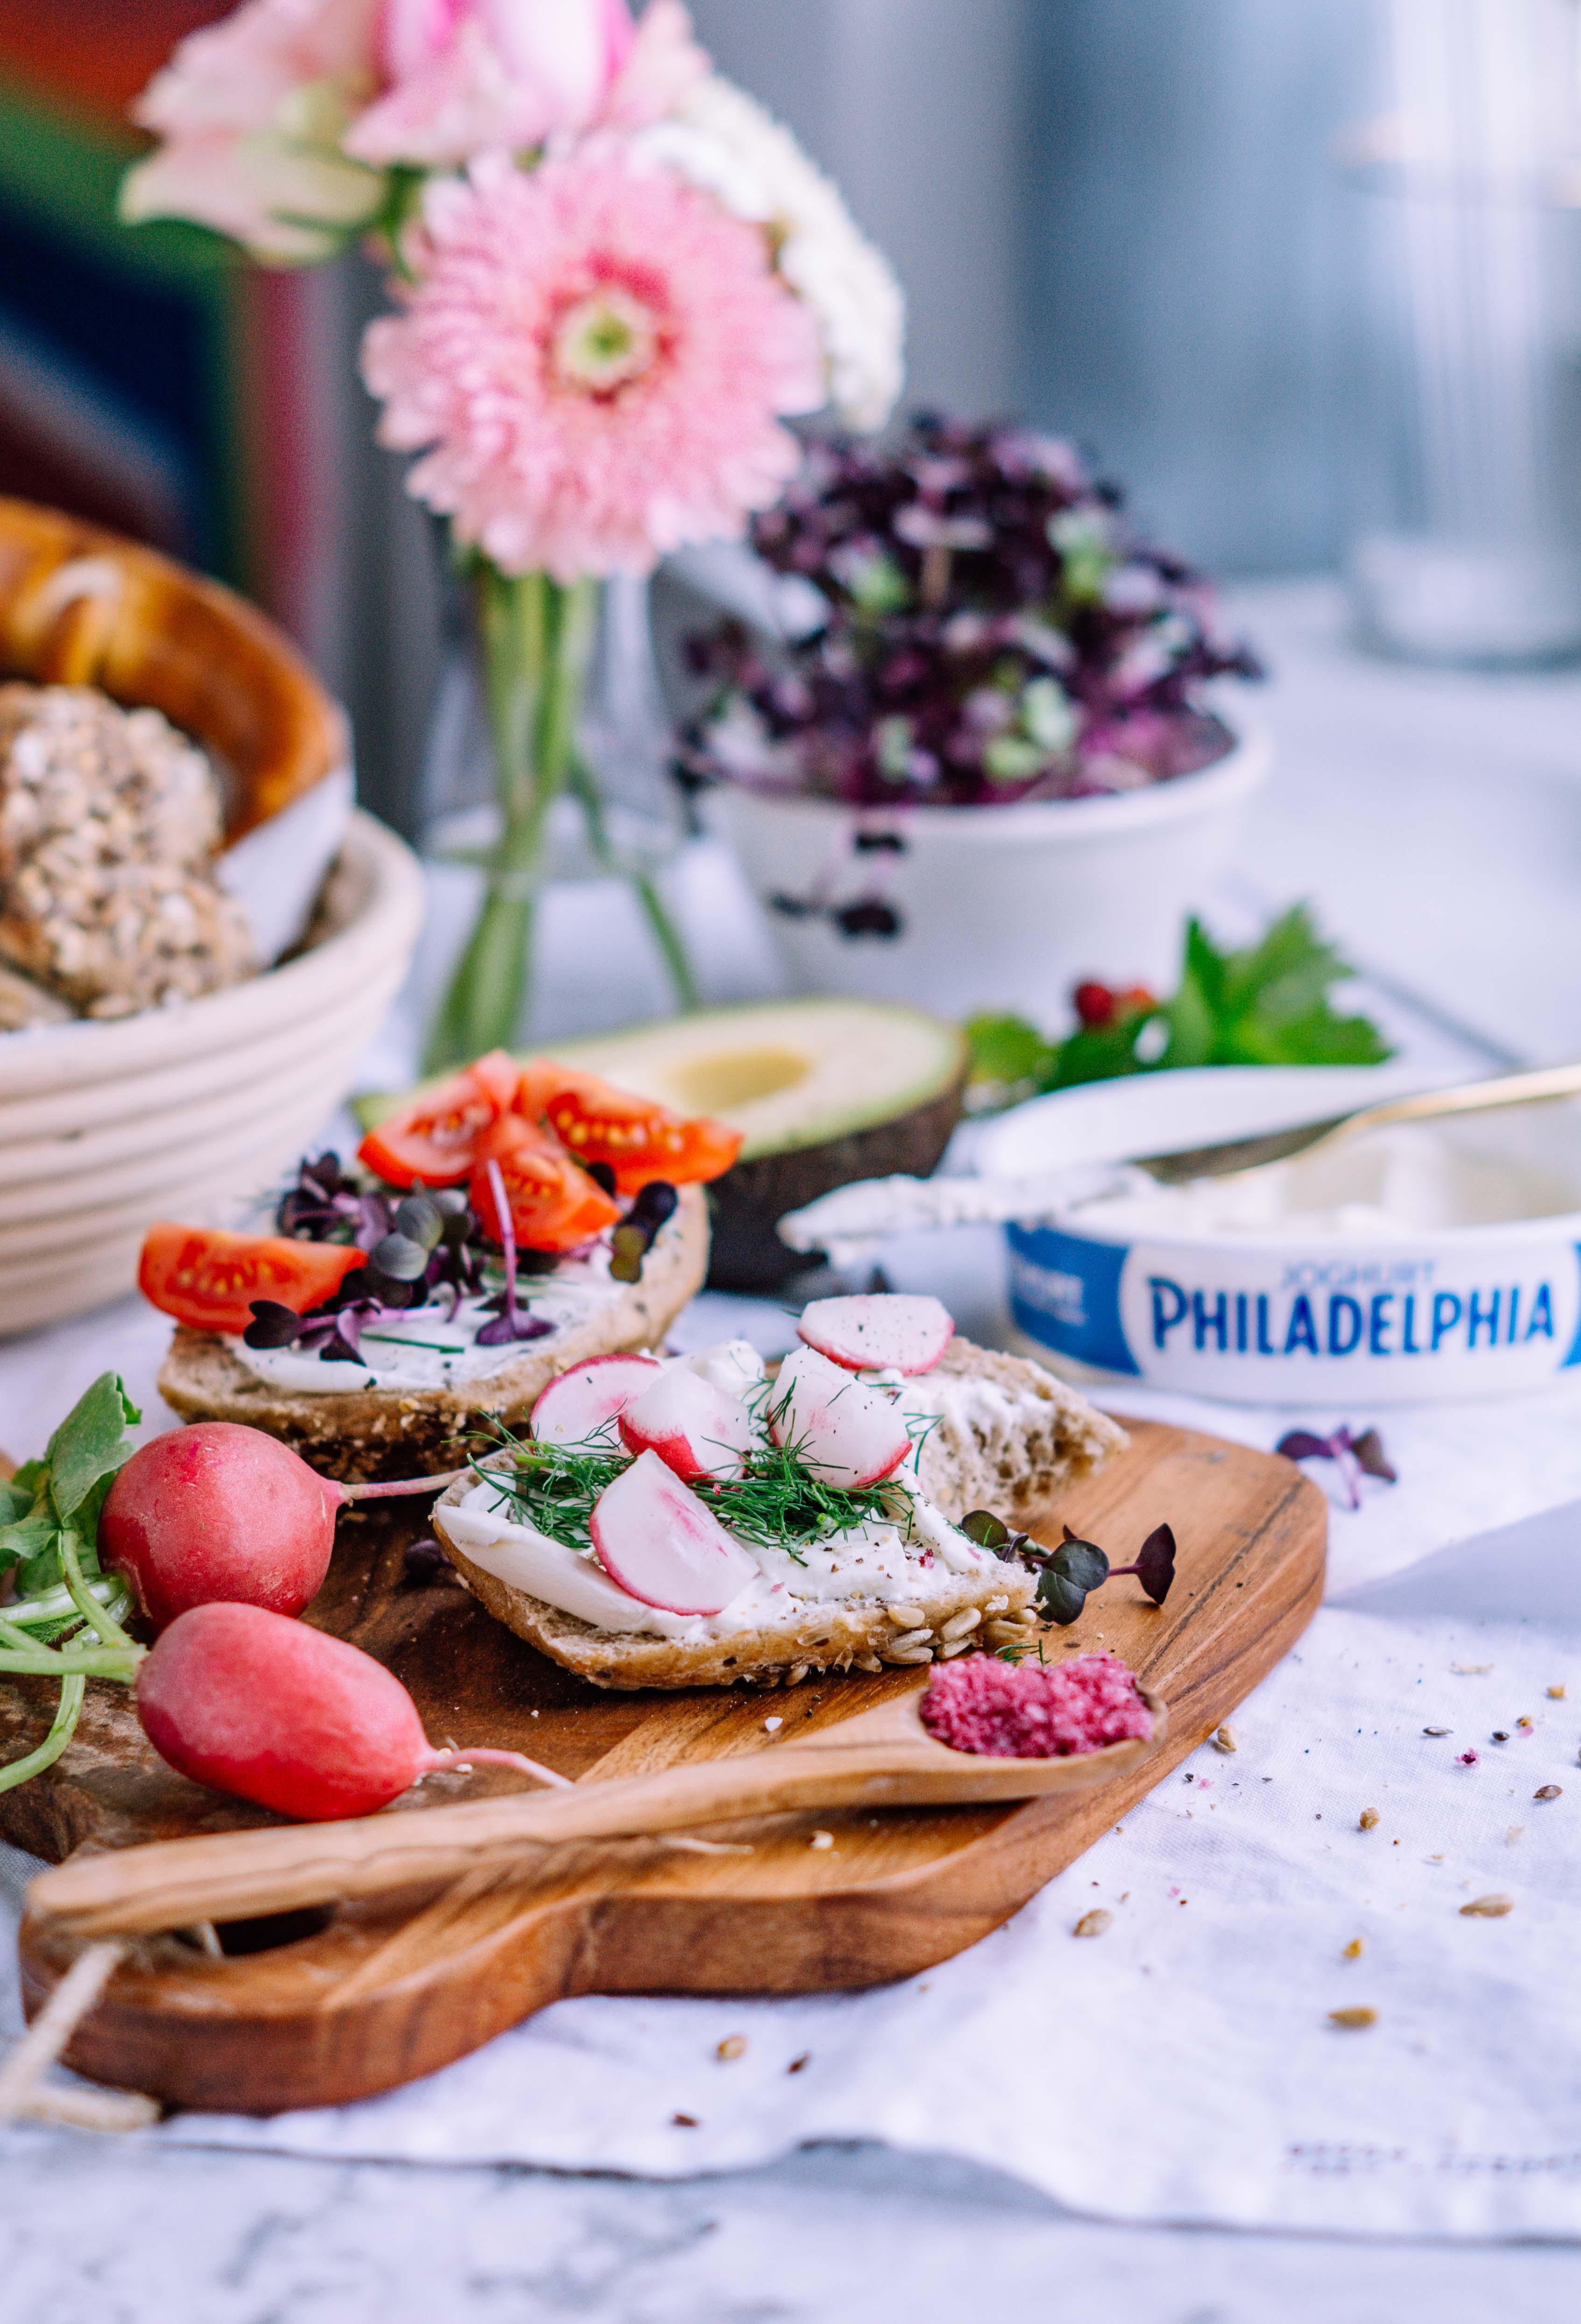 Leckere Frühstücksideen mit Philadelphia Joghurt (enthält Werbung ...